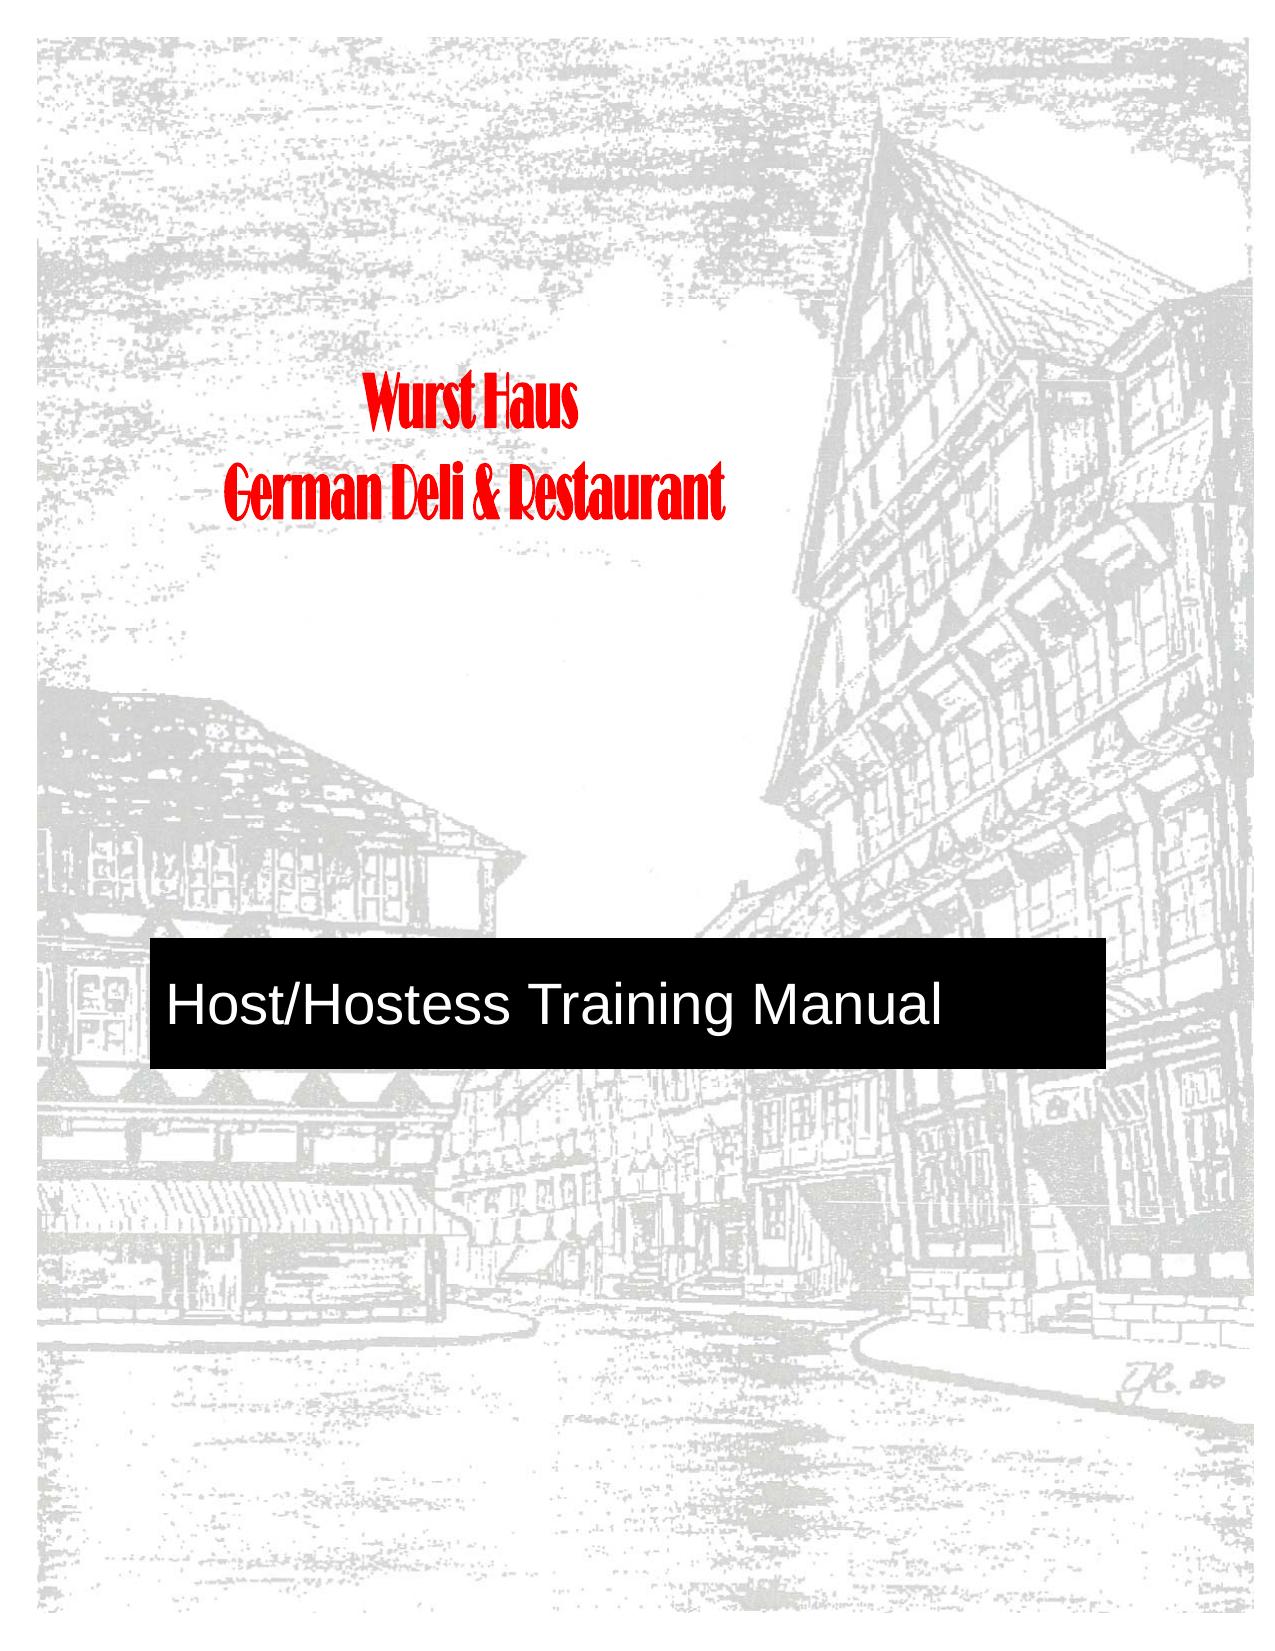 Host/hostess Training Manual